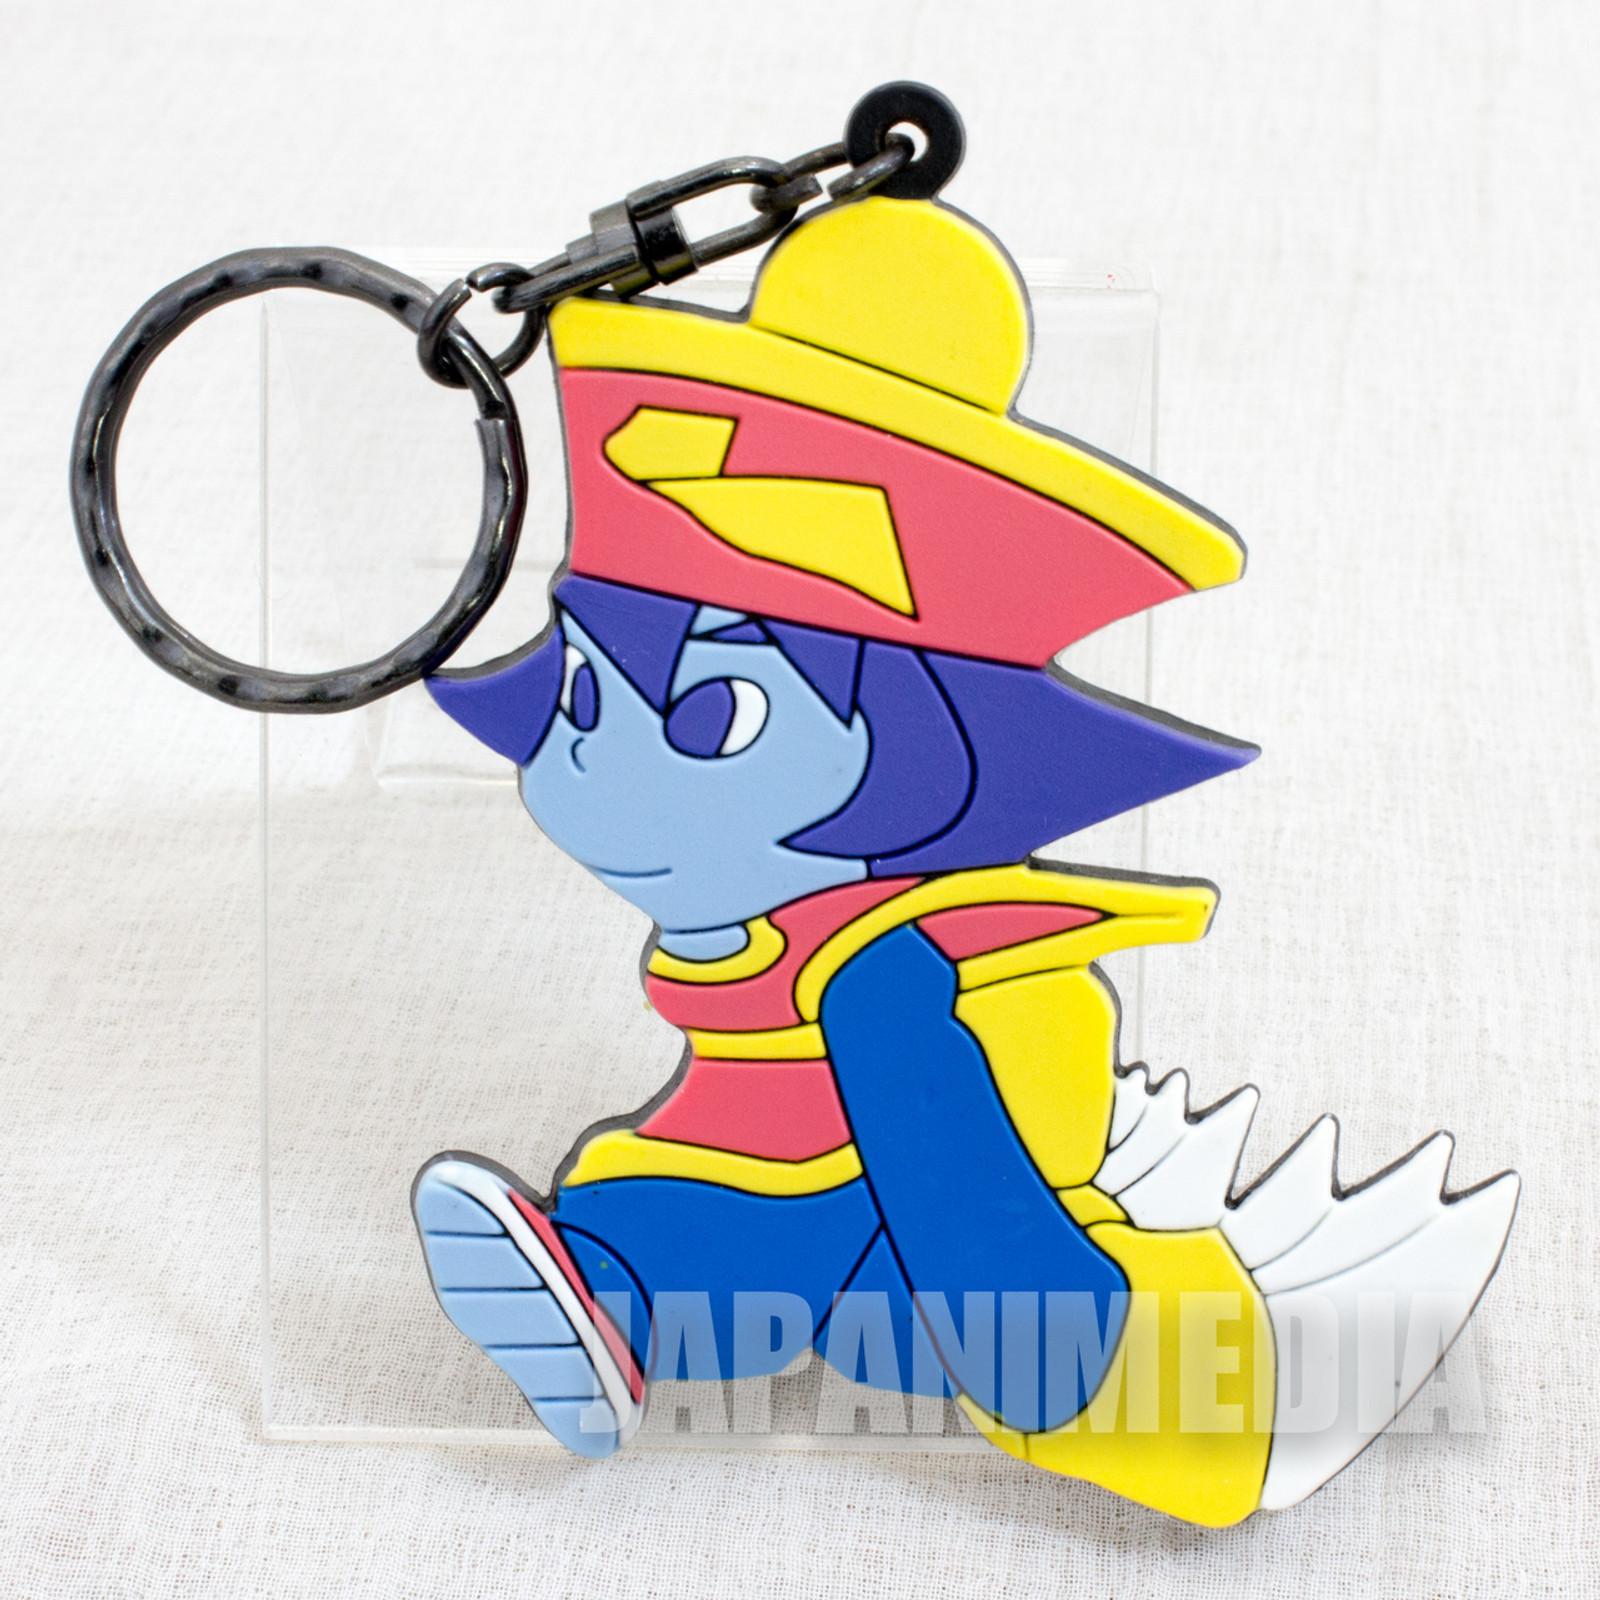 Darkstalkers (Vampire) Lei-Lei Rubber Mascot Keychain Capcom